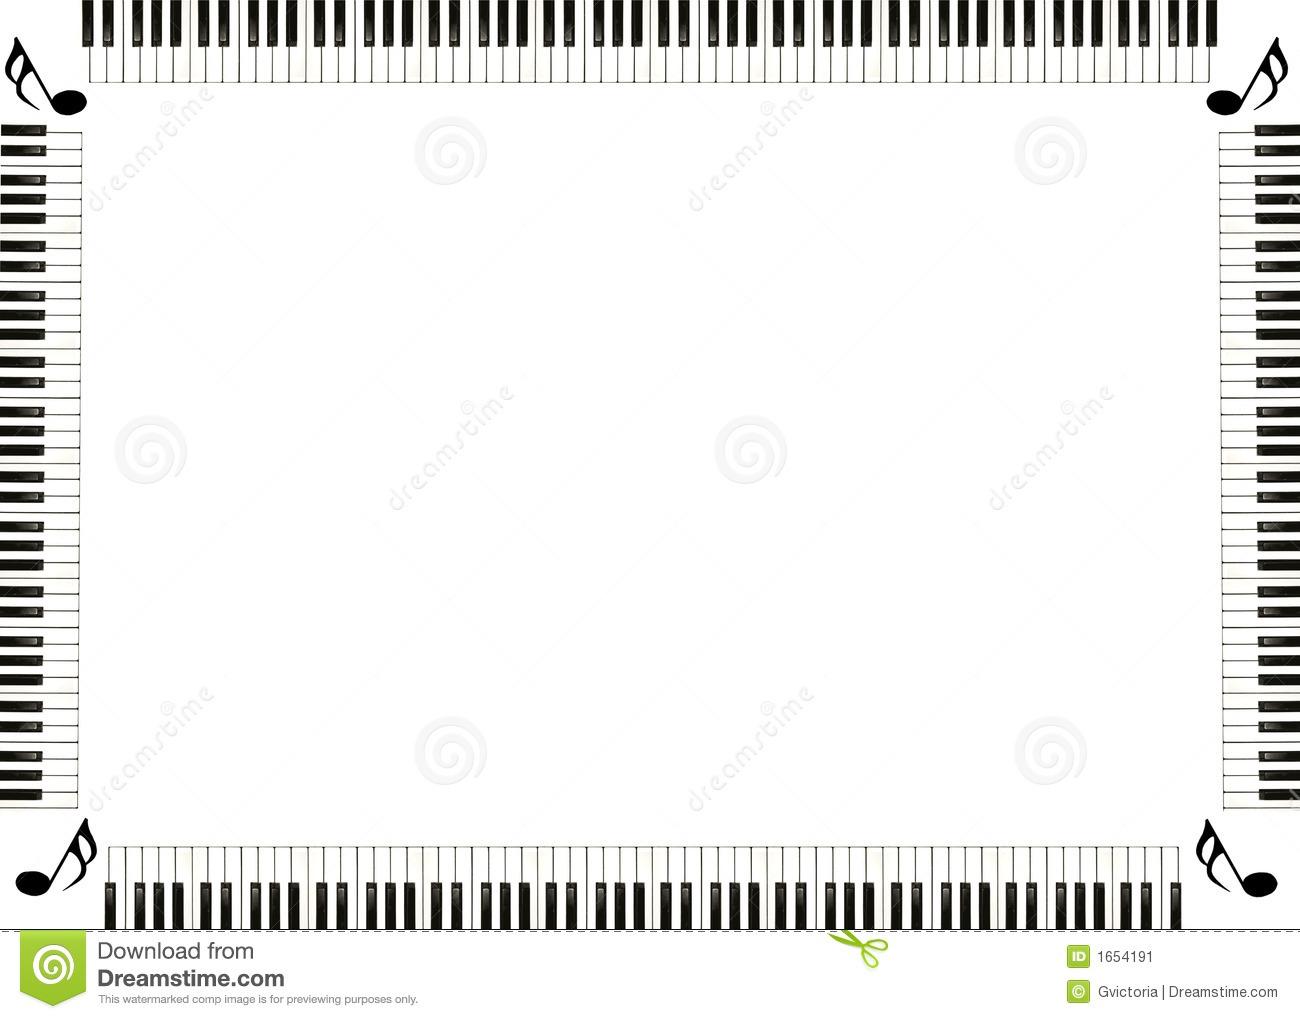 Christmas Tree Keyboard Symbol